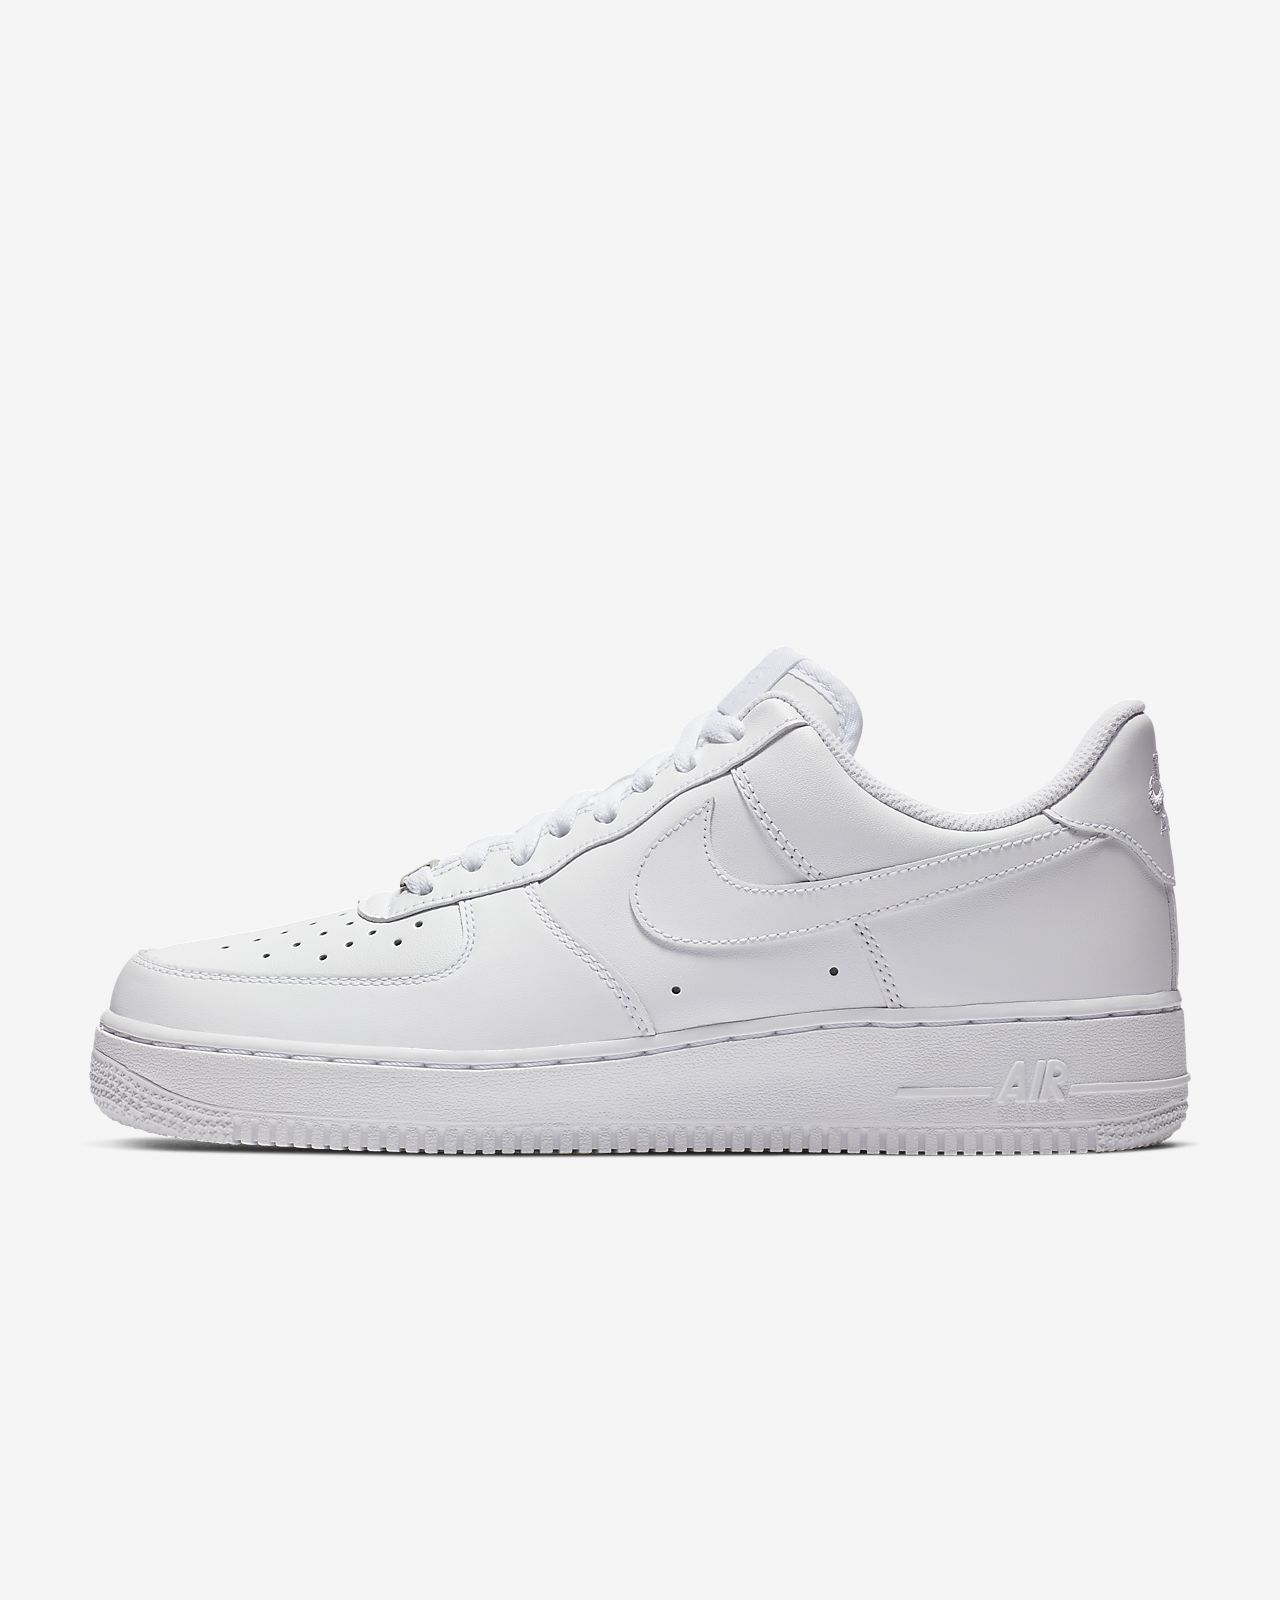 8e34531b61e Γυναικείο παπούτσι Nike Air Force 1 '07. Nike.com GR